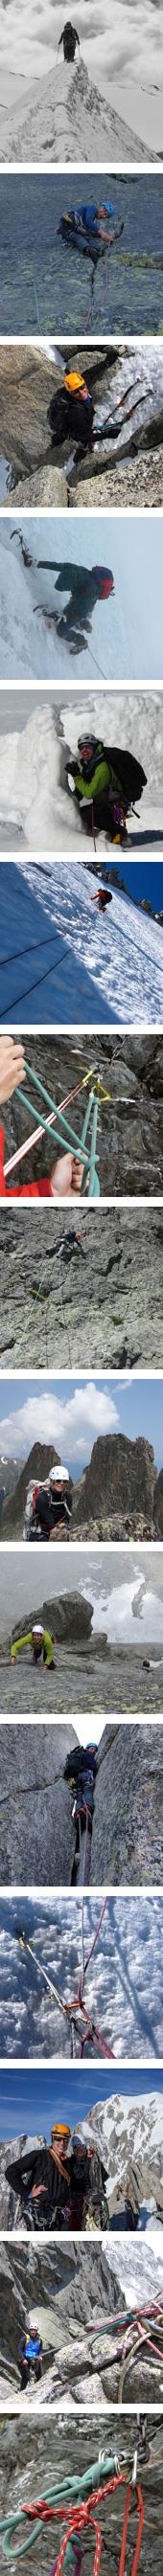 alpine climbing courses